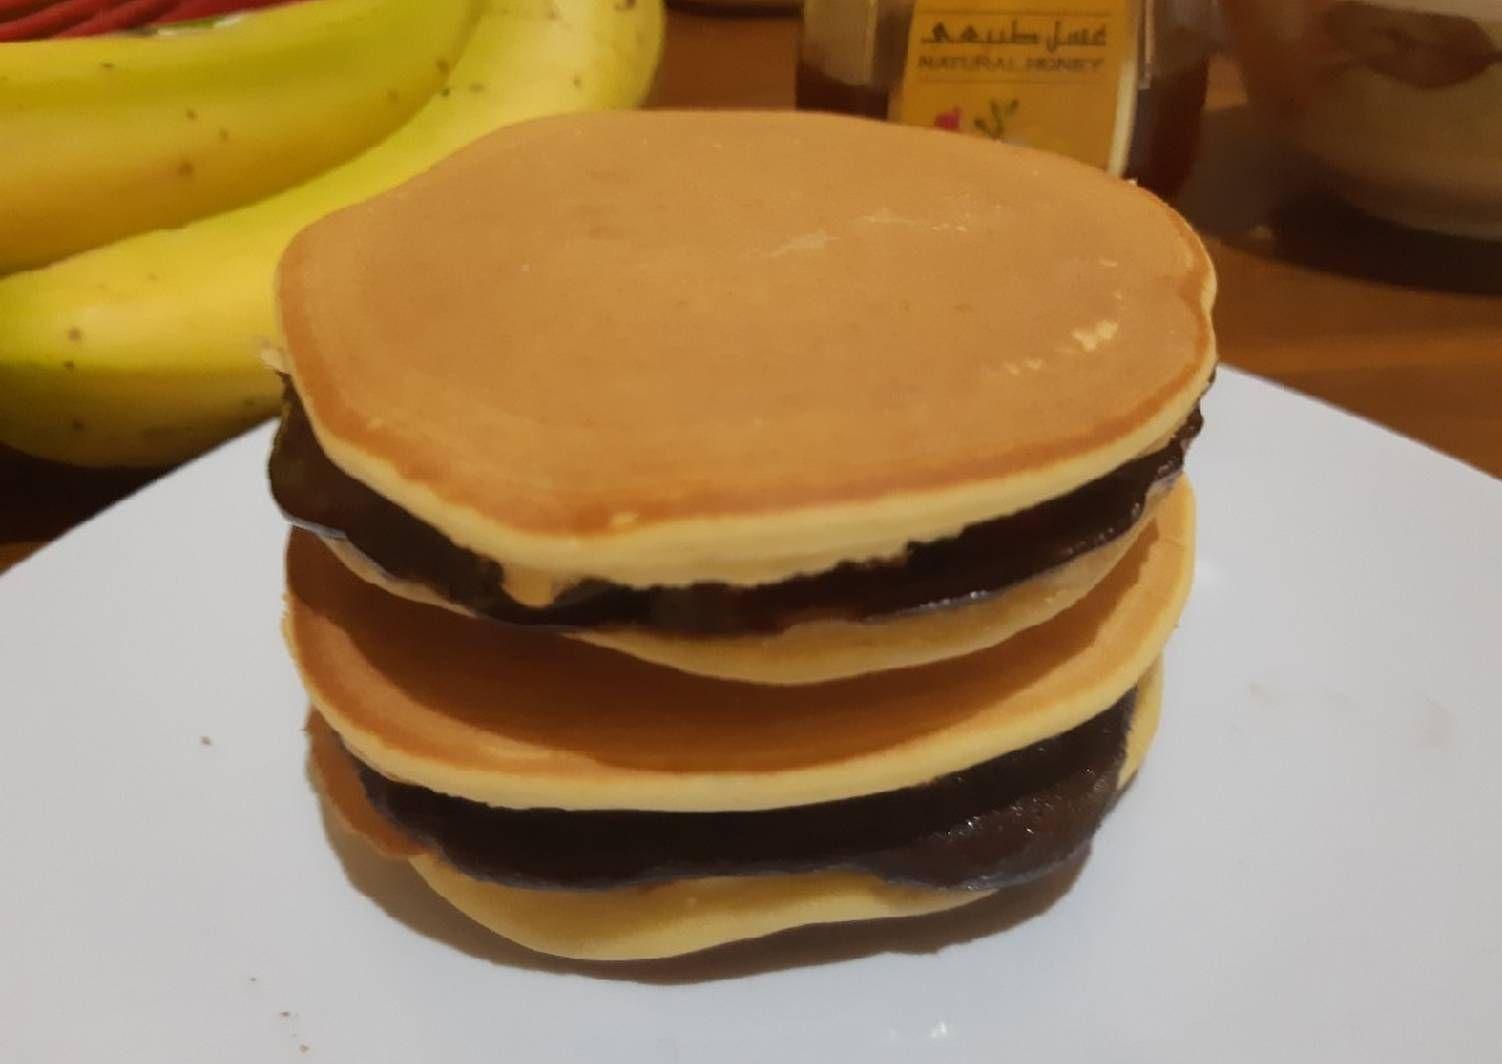 Resep Pancake Jepang Aka Dorayaki Tanpa Soda Kue Oleh Diana Pugas Resep Makanan Kue Dadar Resep